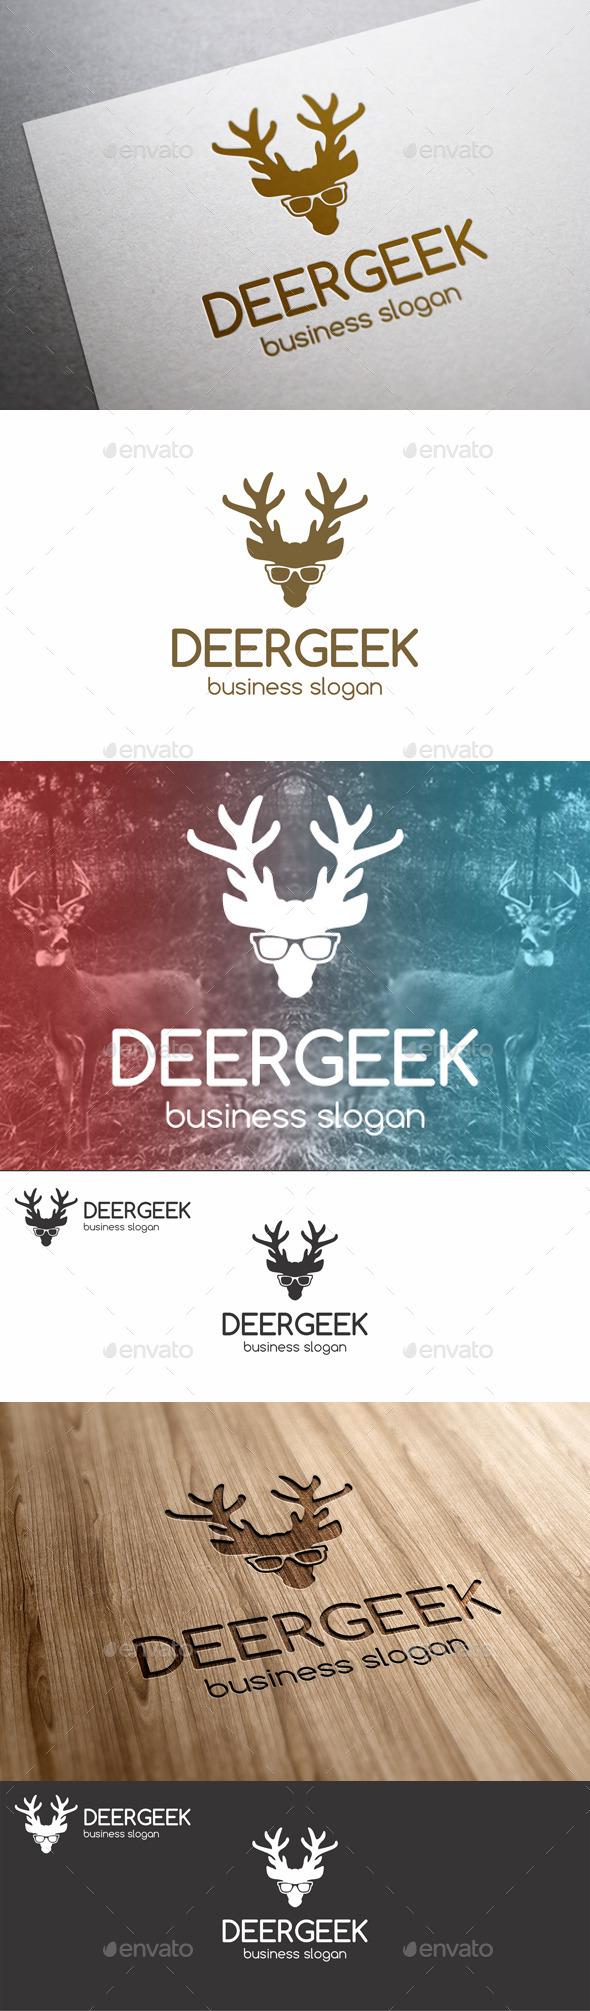 GraphicRiver Deer Geek Animal Logo 9935128